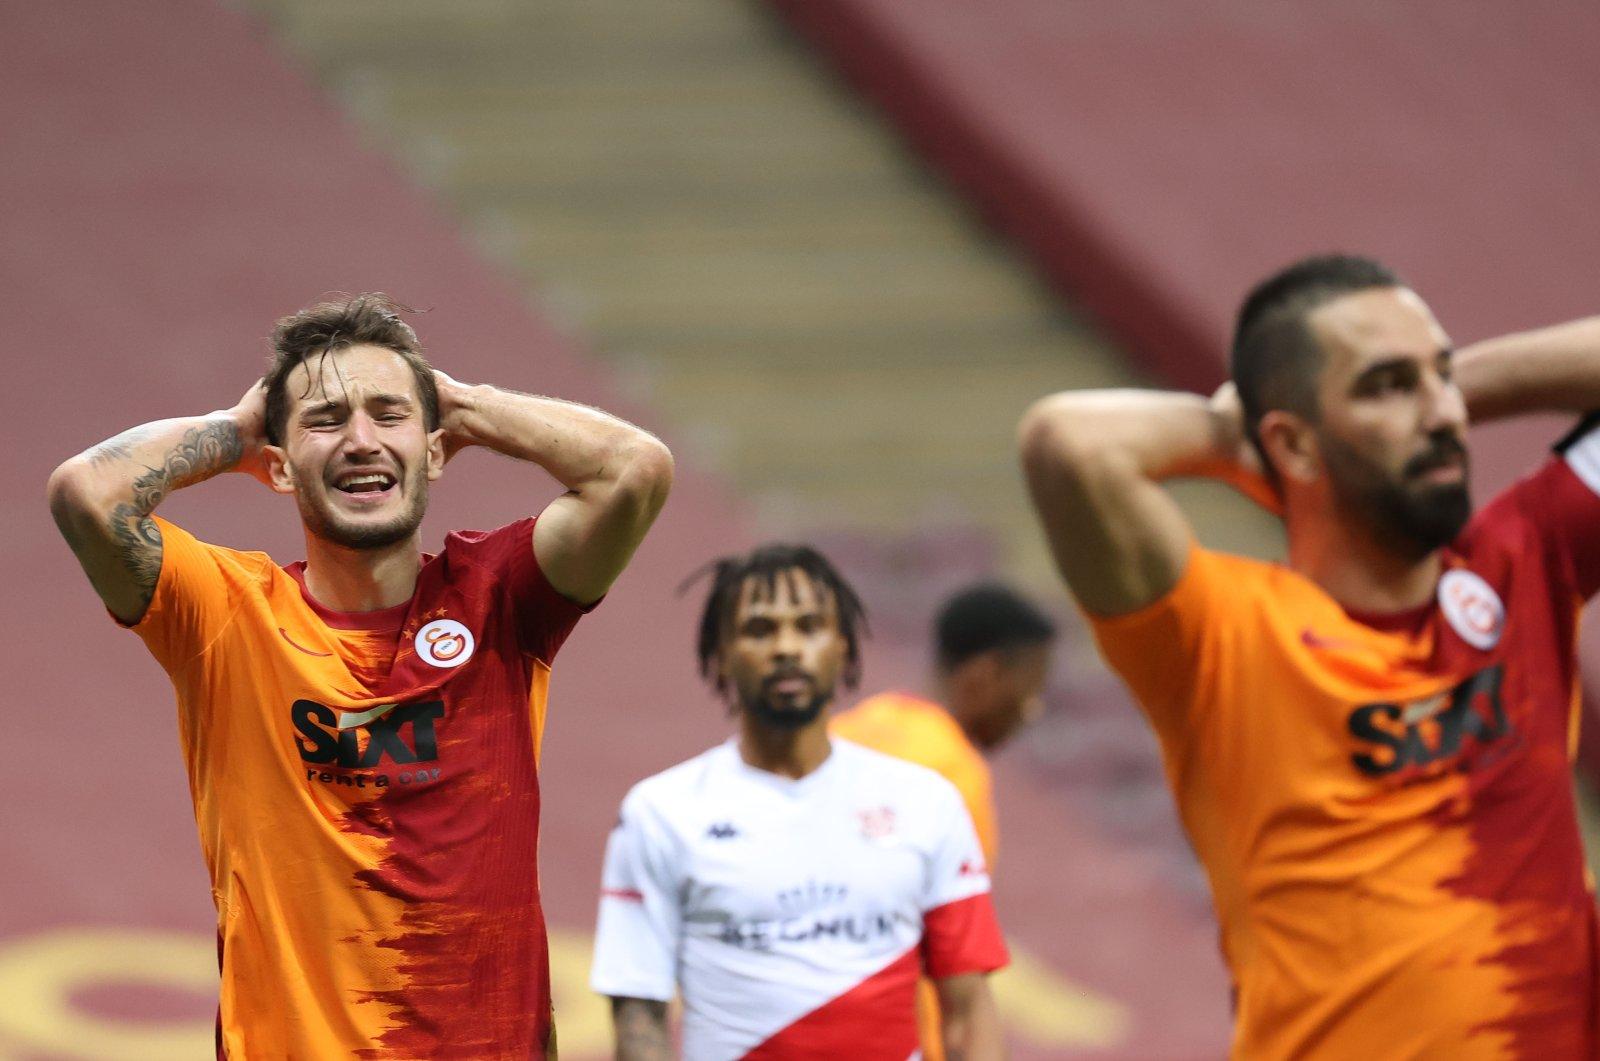 Galatasaray's Oğulcan Çağlayan (L) and Arda Turan (R) react during a Süper Lig match against Antalyaspor at the Türk Telekom Arena, in Istanbul, Turkey, Jan. 2, 2021. (AA Photo)